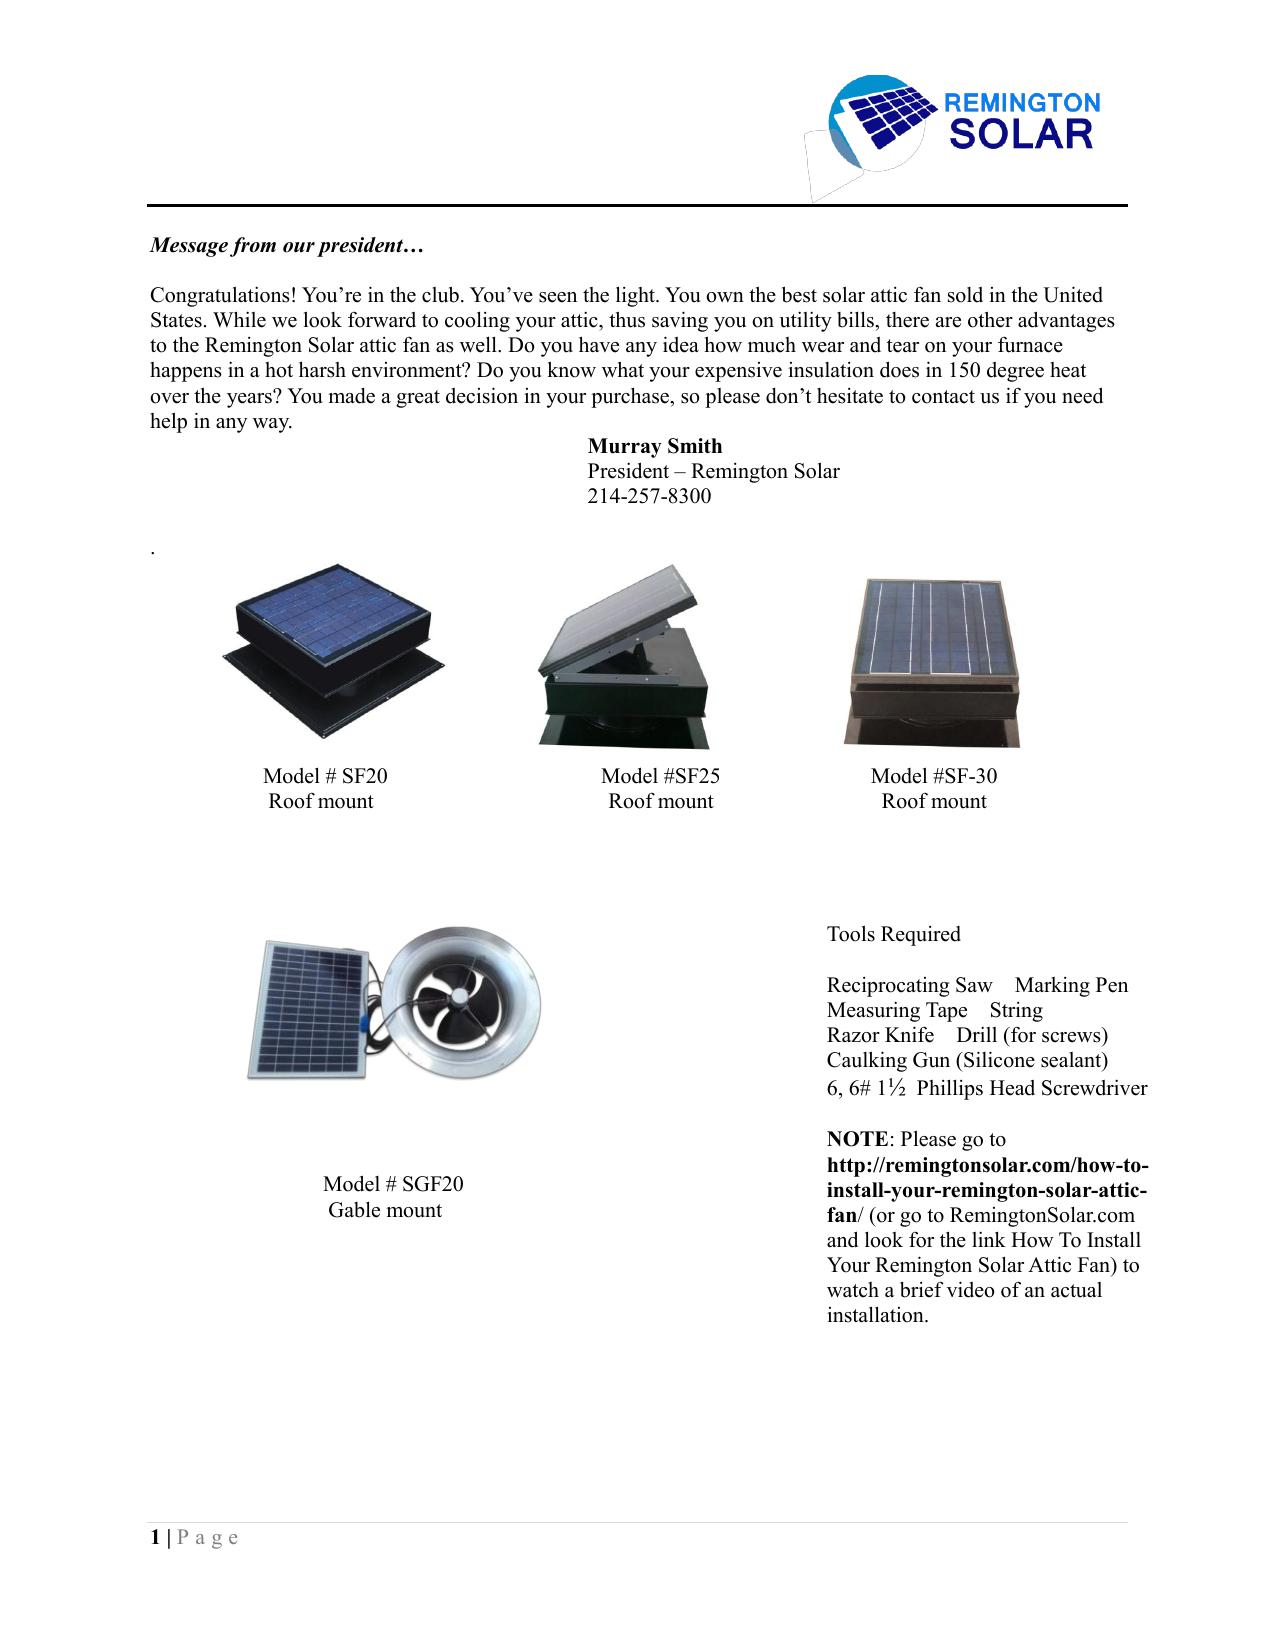 Solar Attic Fan - Remington Solar | Manualzzmanualzz